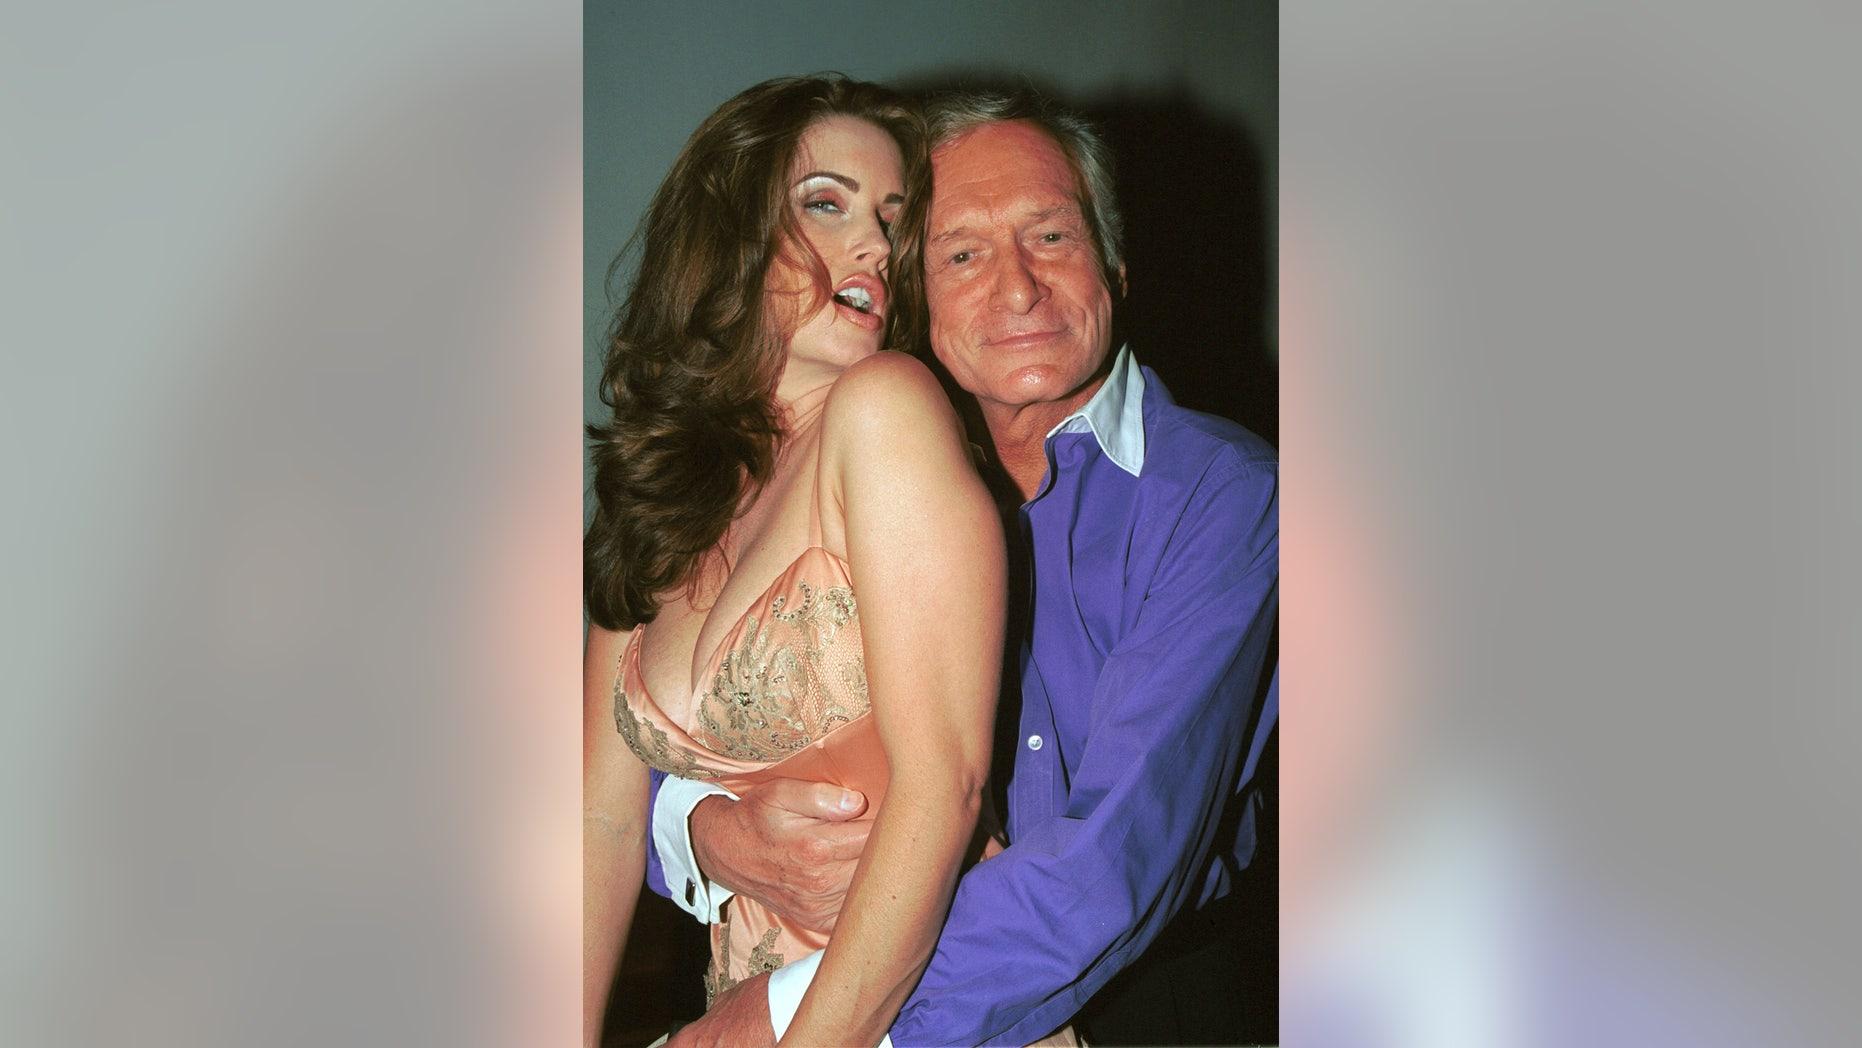 Model Carrie Stevens poses with Playboy founder Hugh Hefner in 2002.